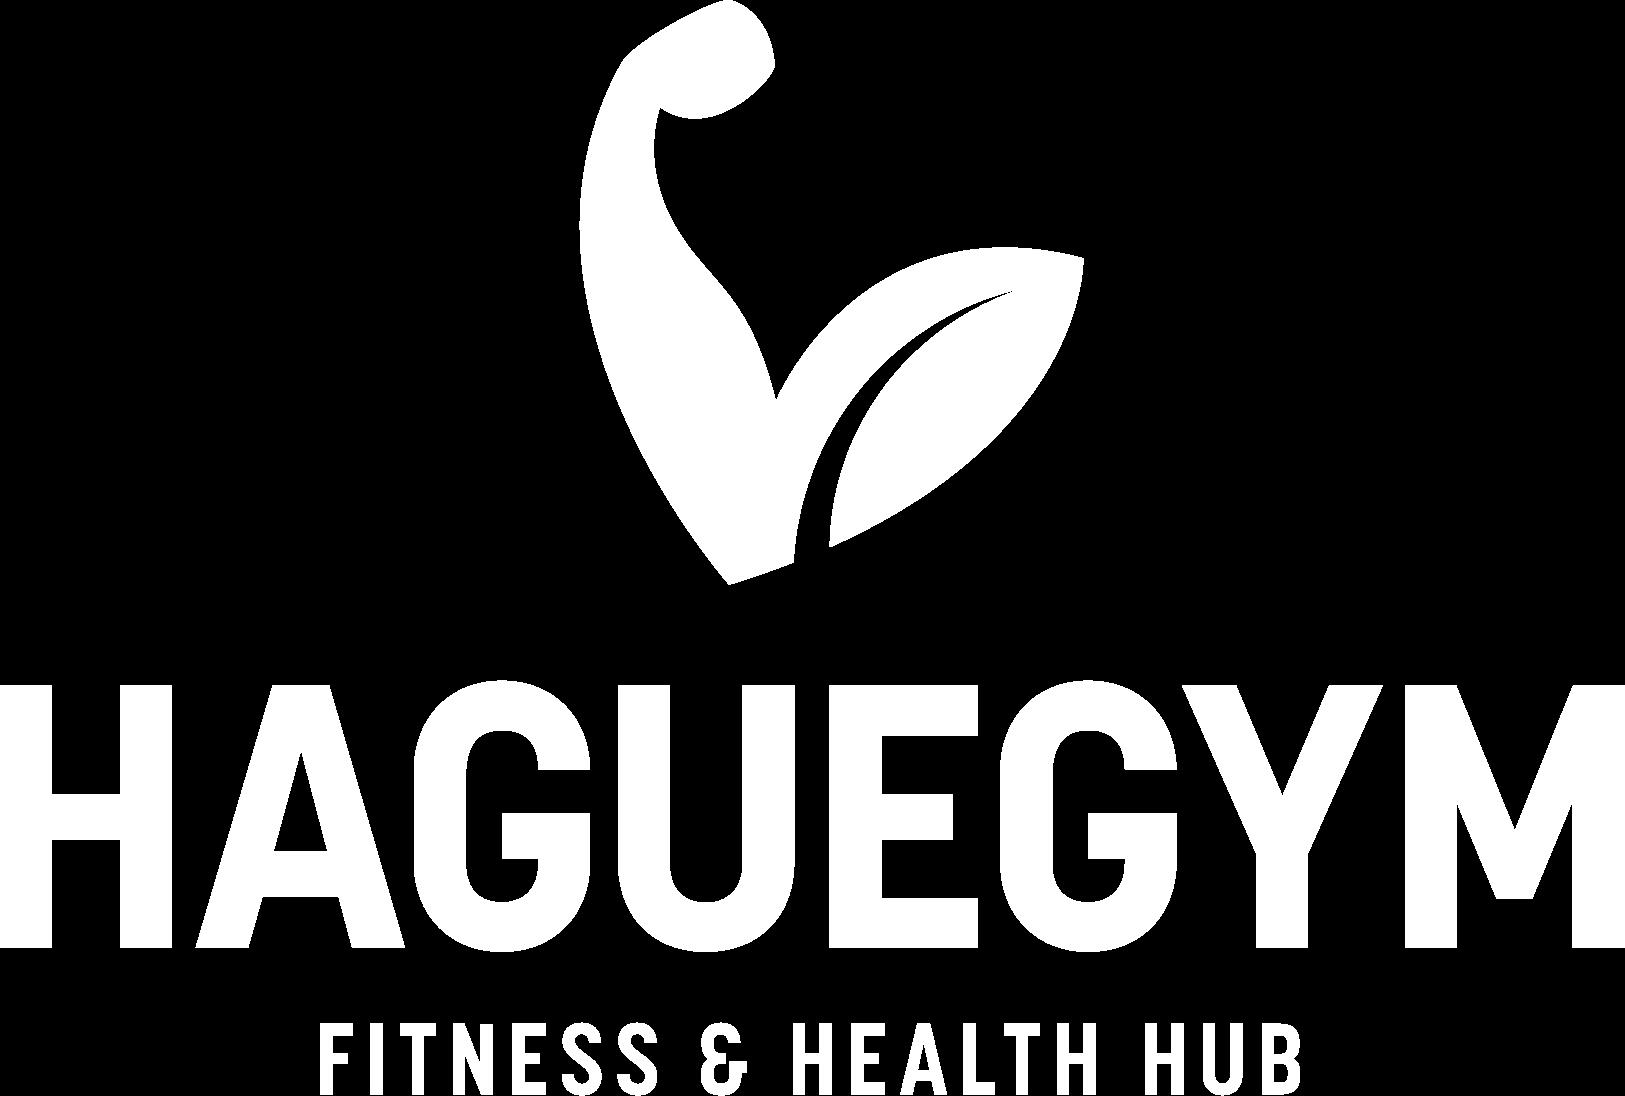 The Hague gym